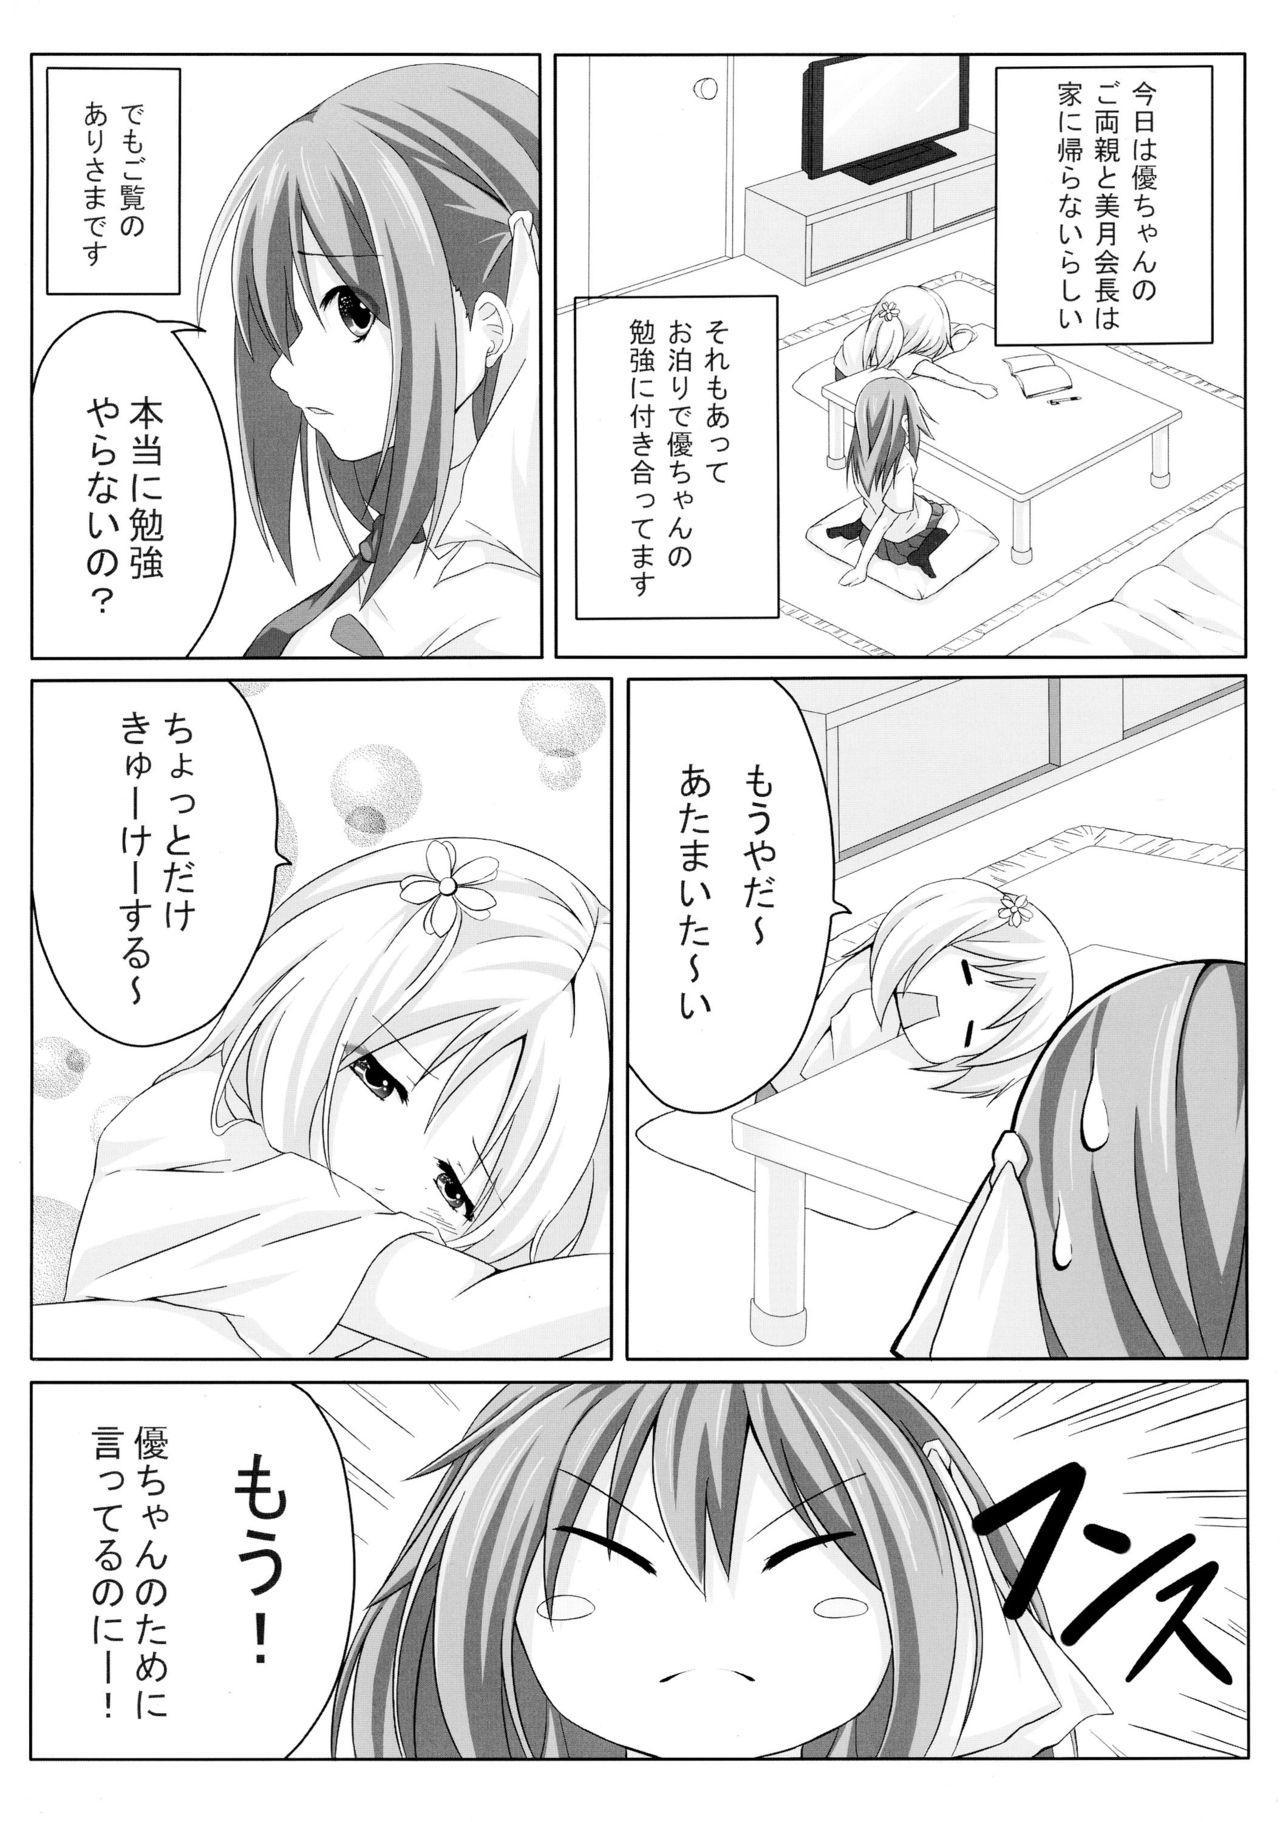 Sakura Strip 3